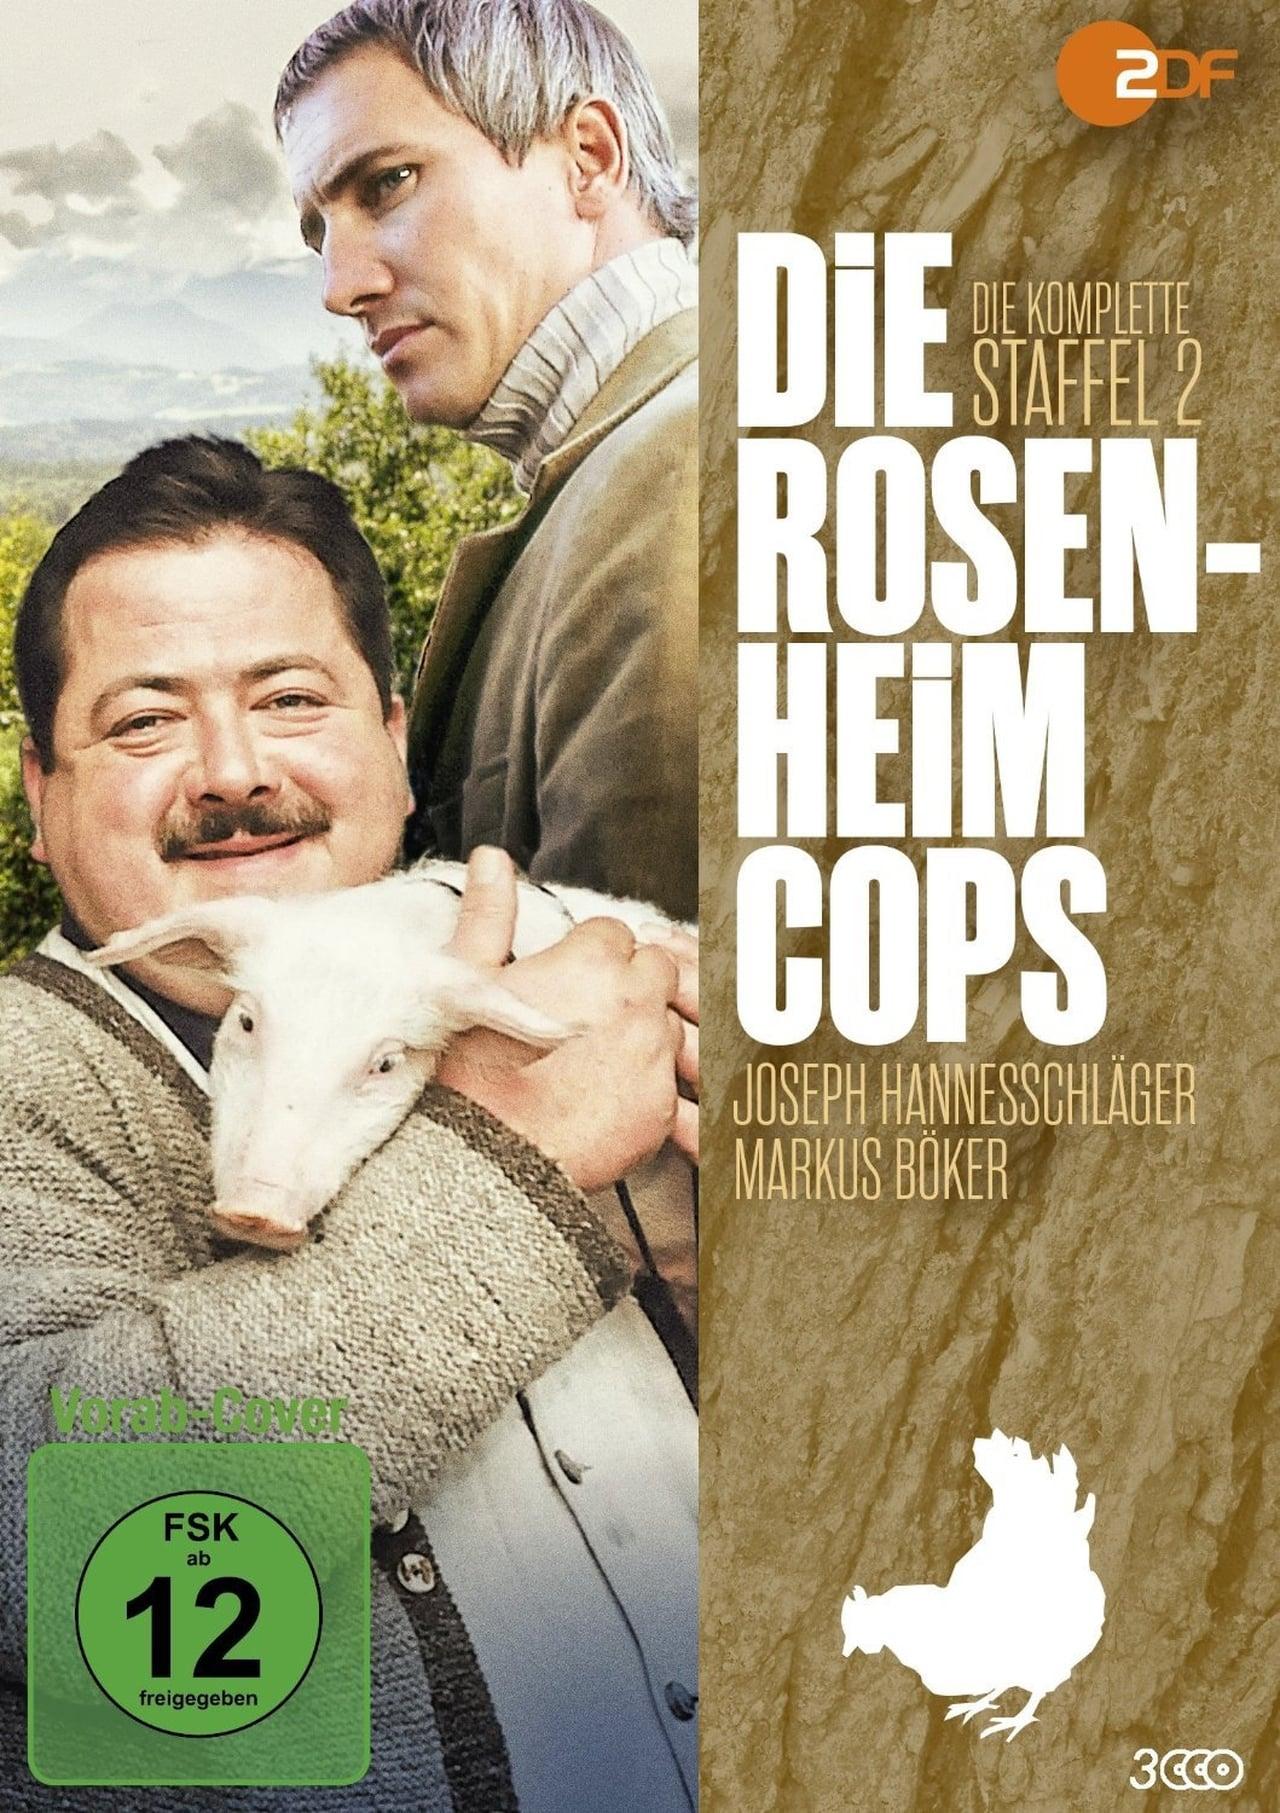 Watch The Rosenheim Cops Season 2 Online